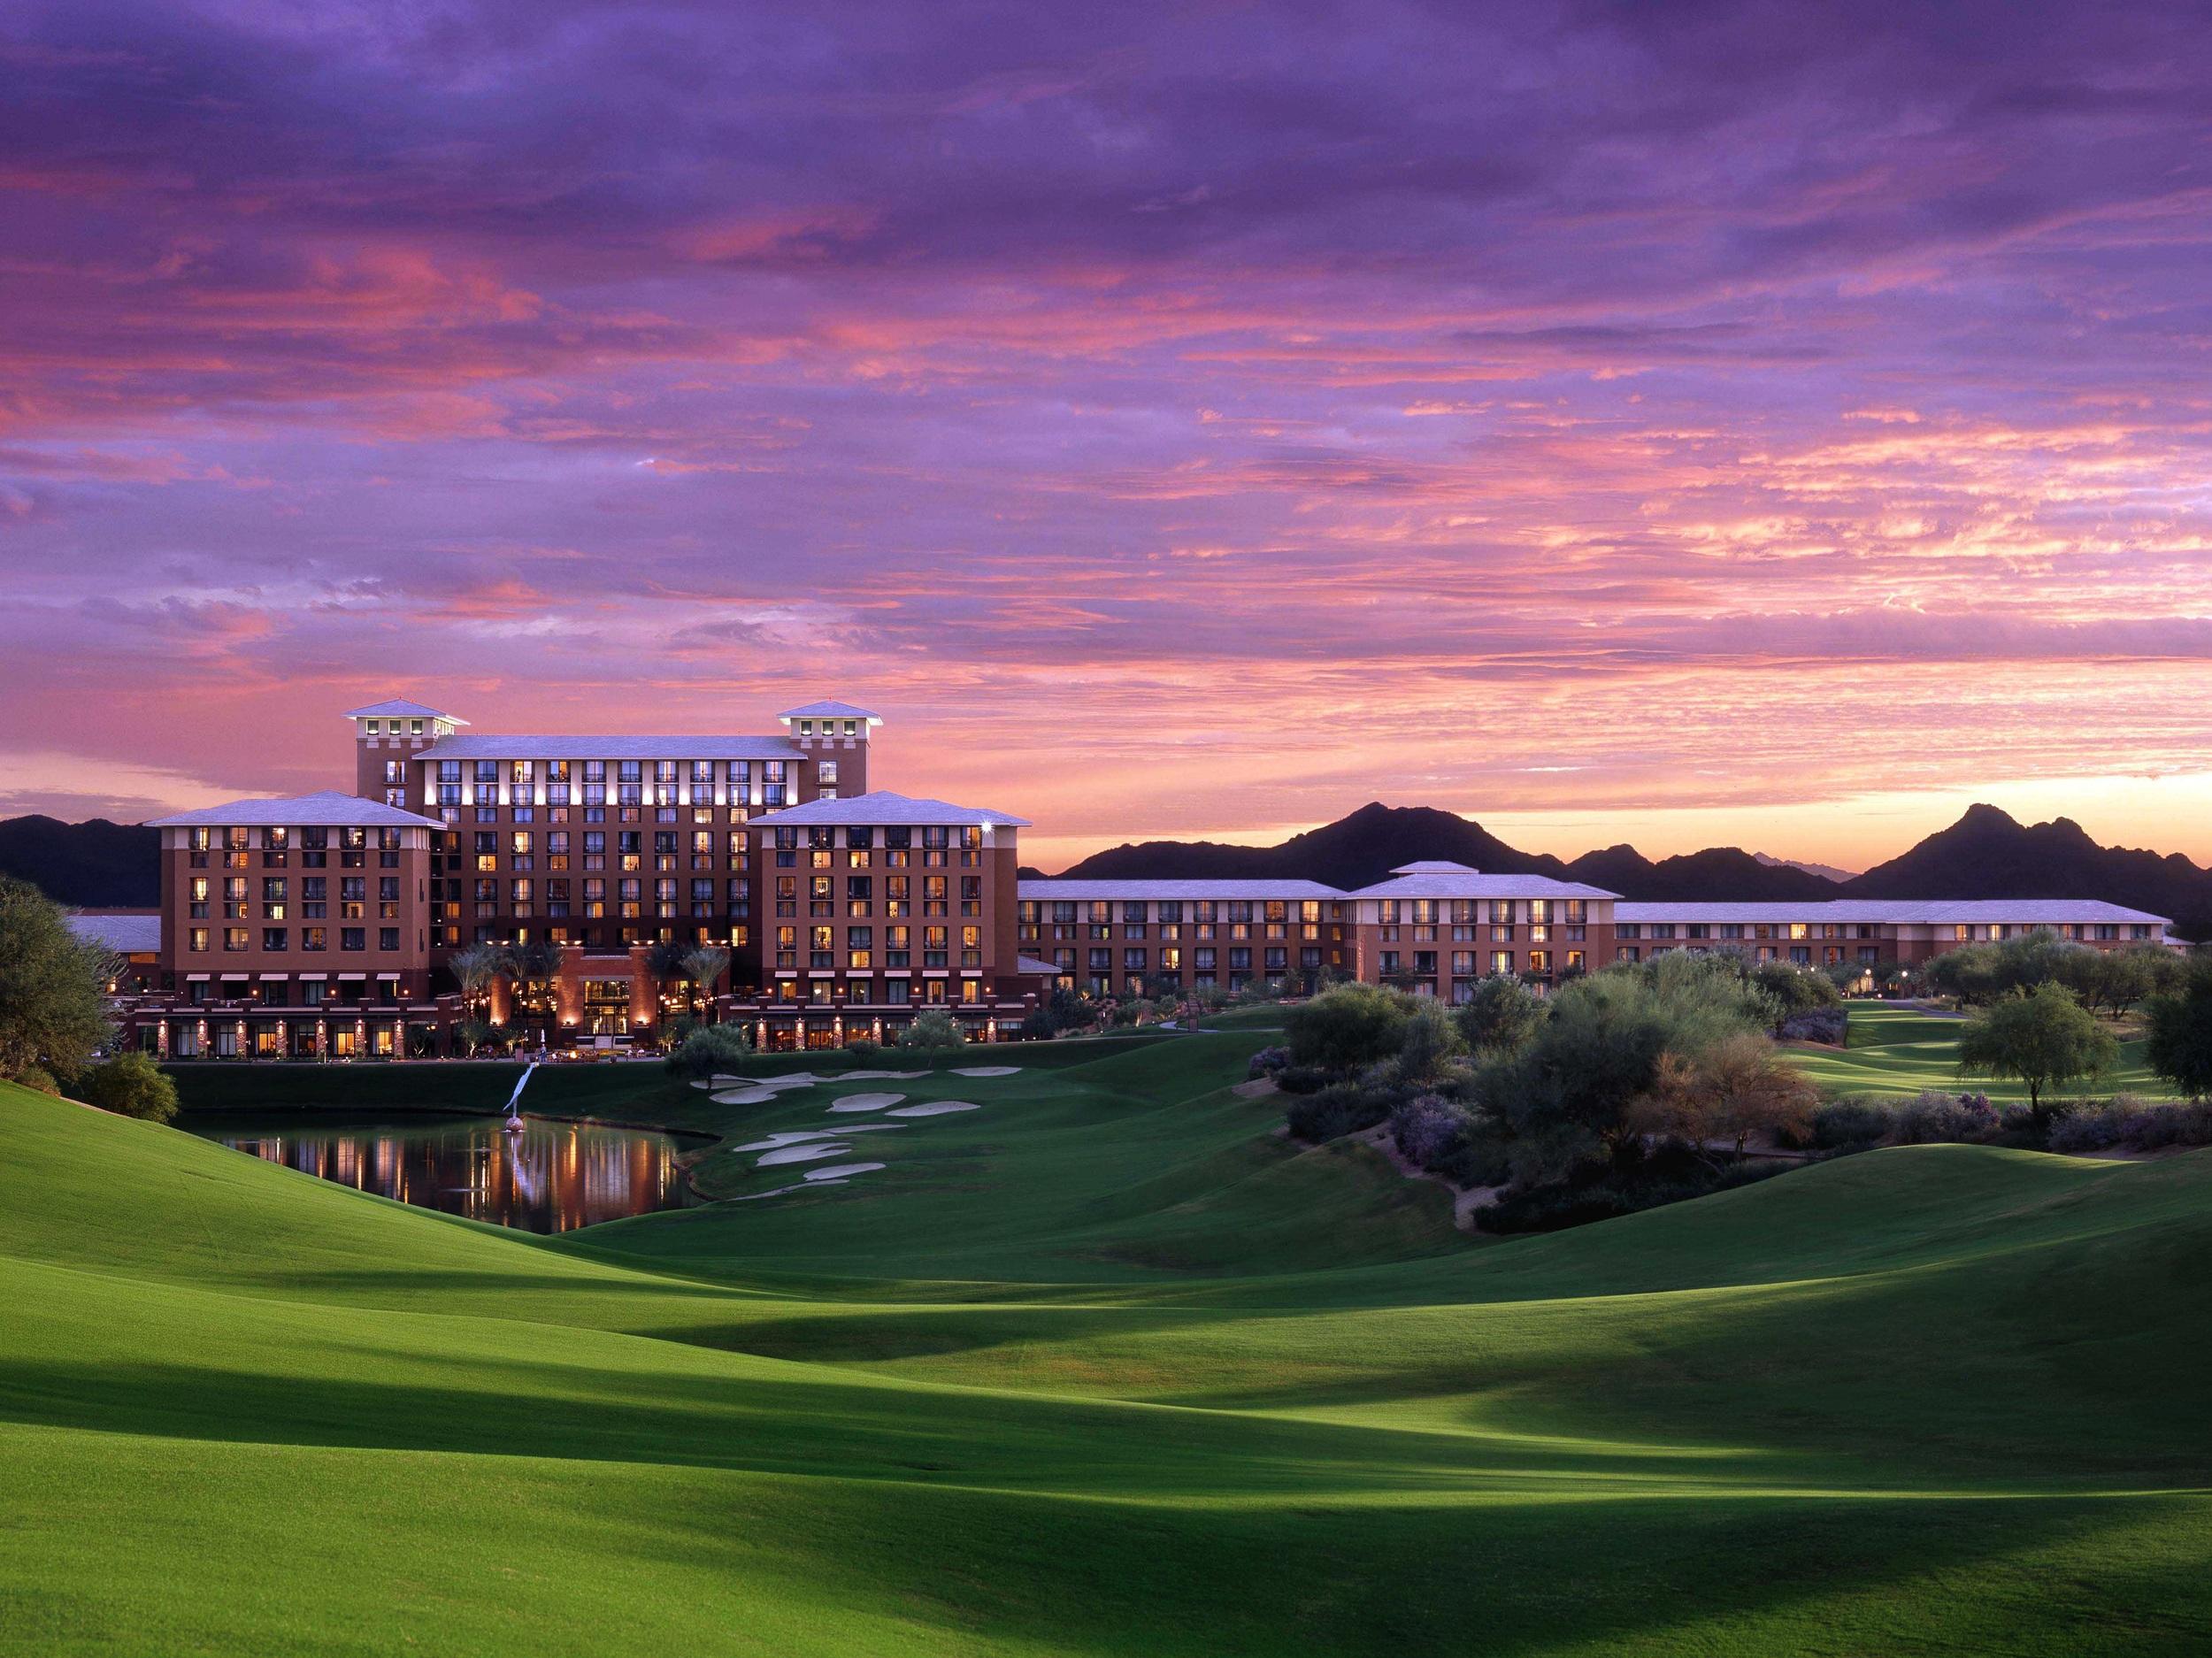 The+Westin+Kierland+Resort+%26+Spa+-+purple+sky.jpg